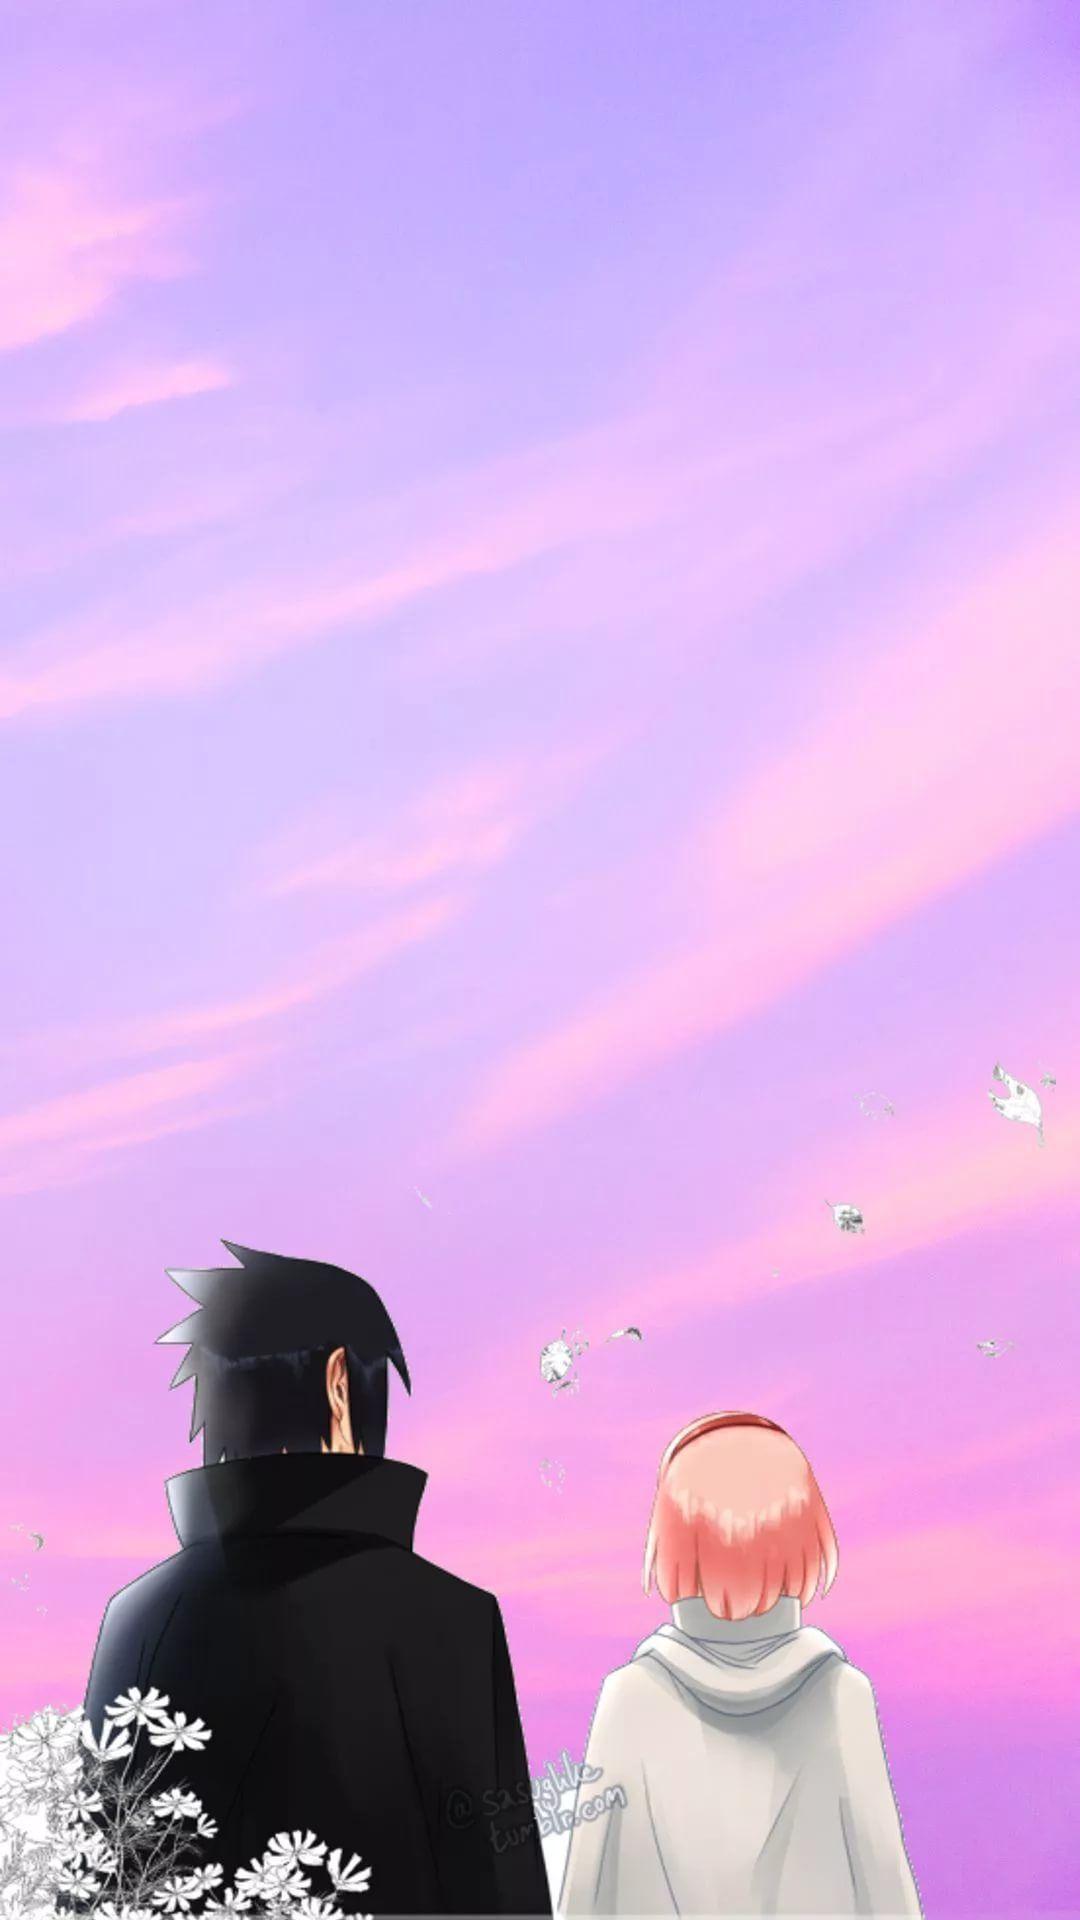 Sasuke Chidori wallpaper for android